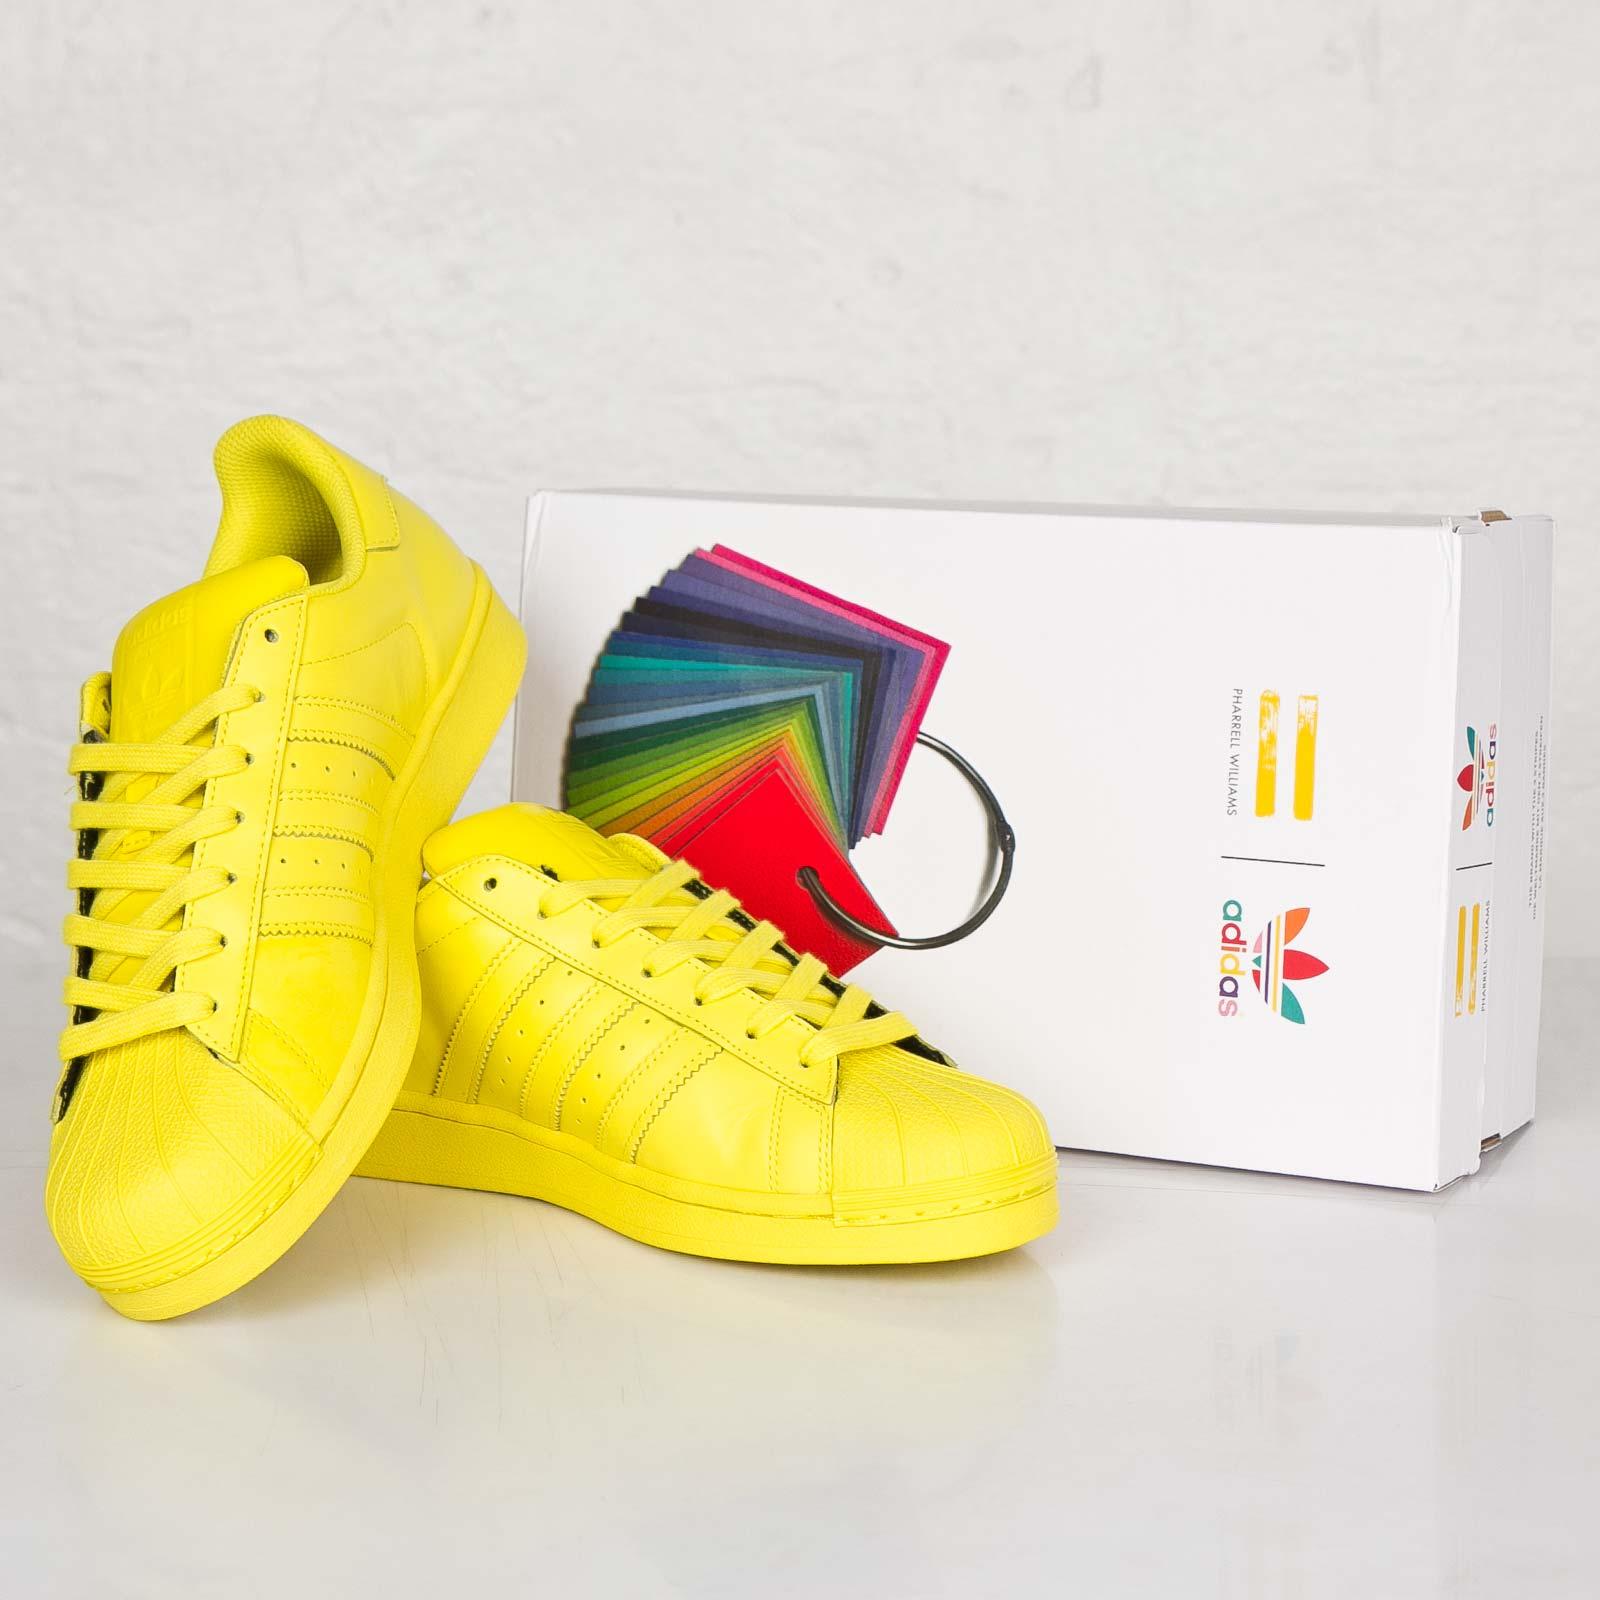 2553cd26cd705 ... norway sepatu adidas pharel william original by jual adidas superstar  supercolor pharrell williams yellow 36e18 426b8